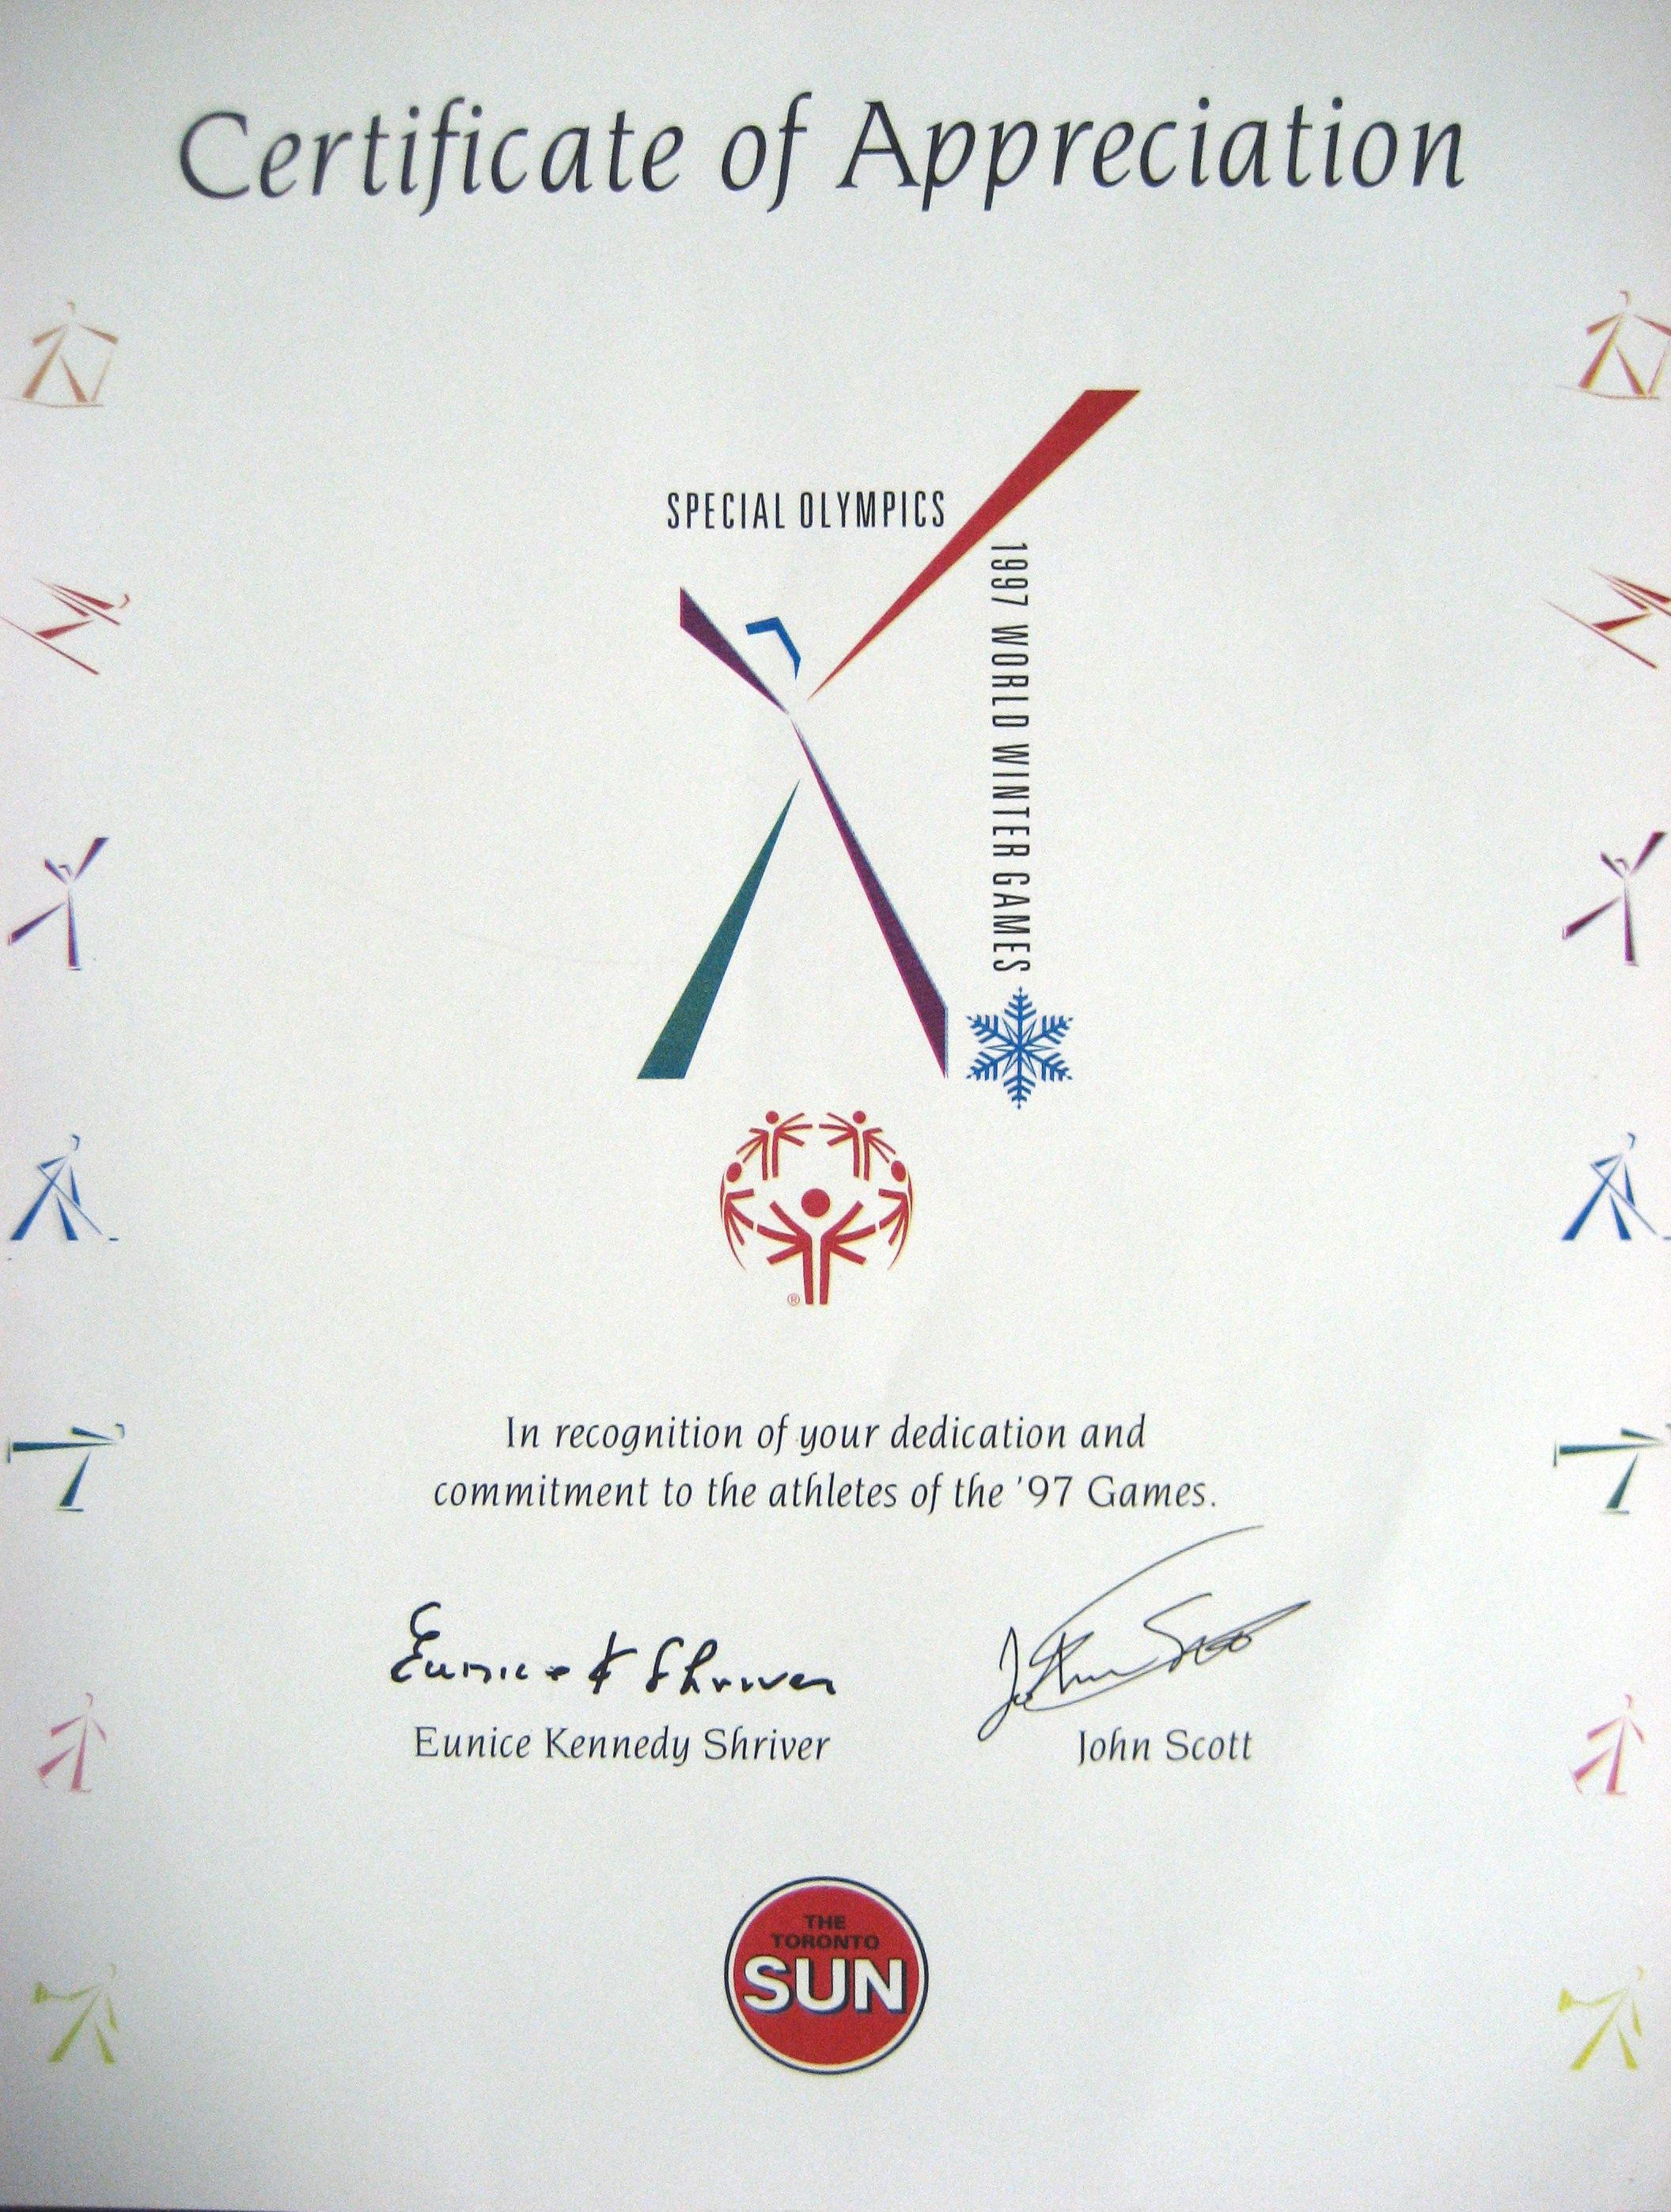 Special Olympics 1997